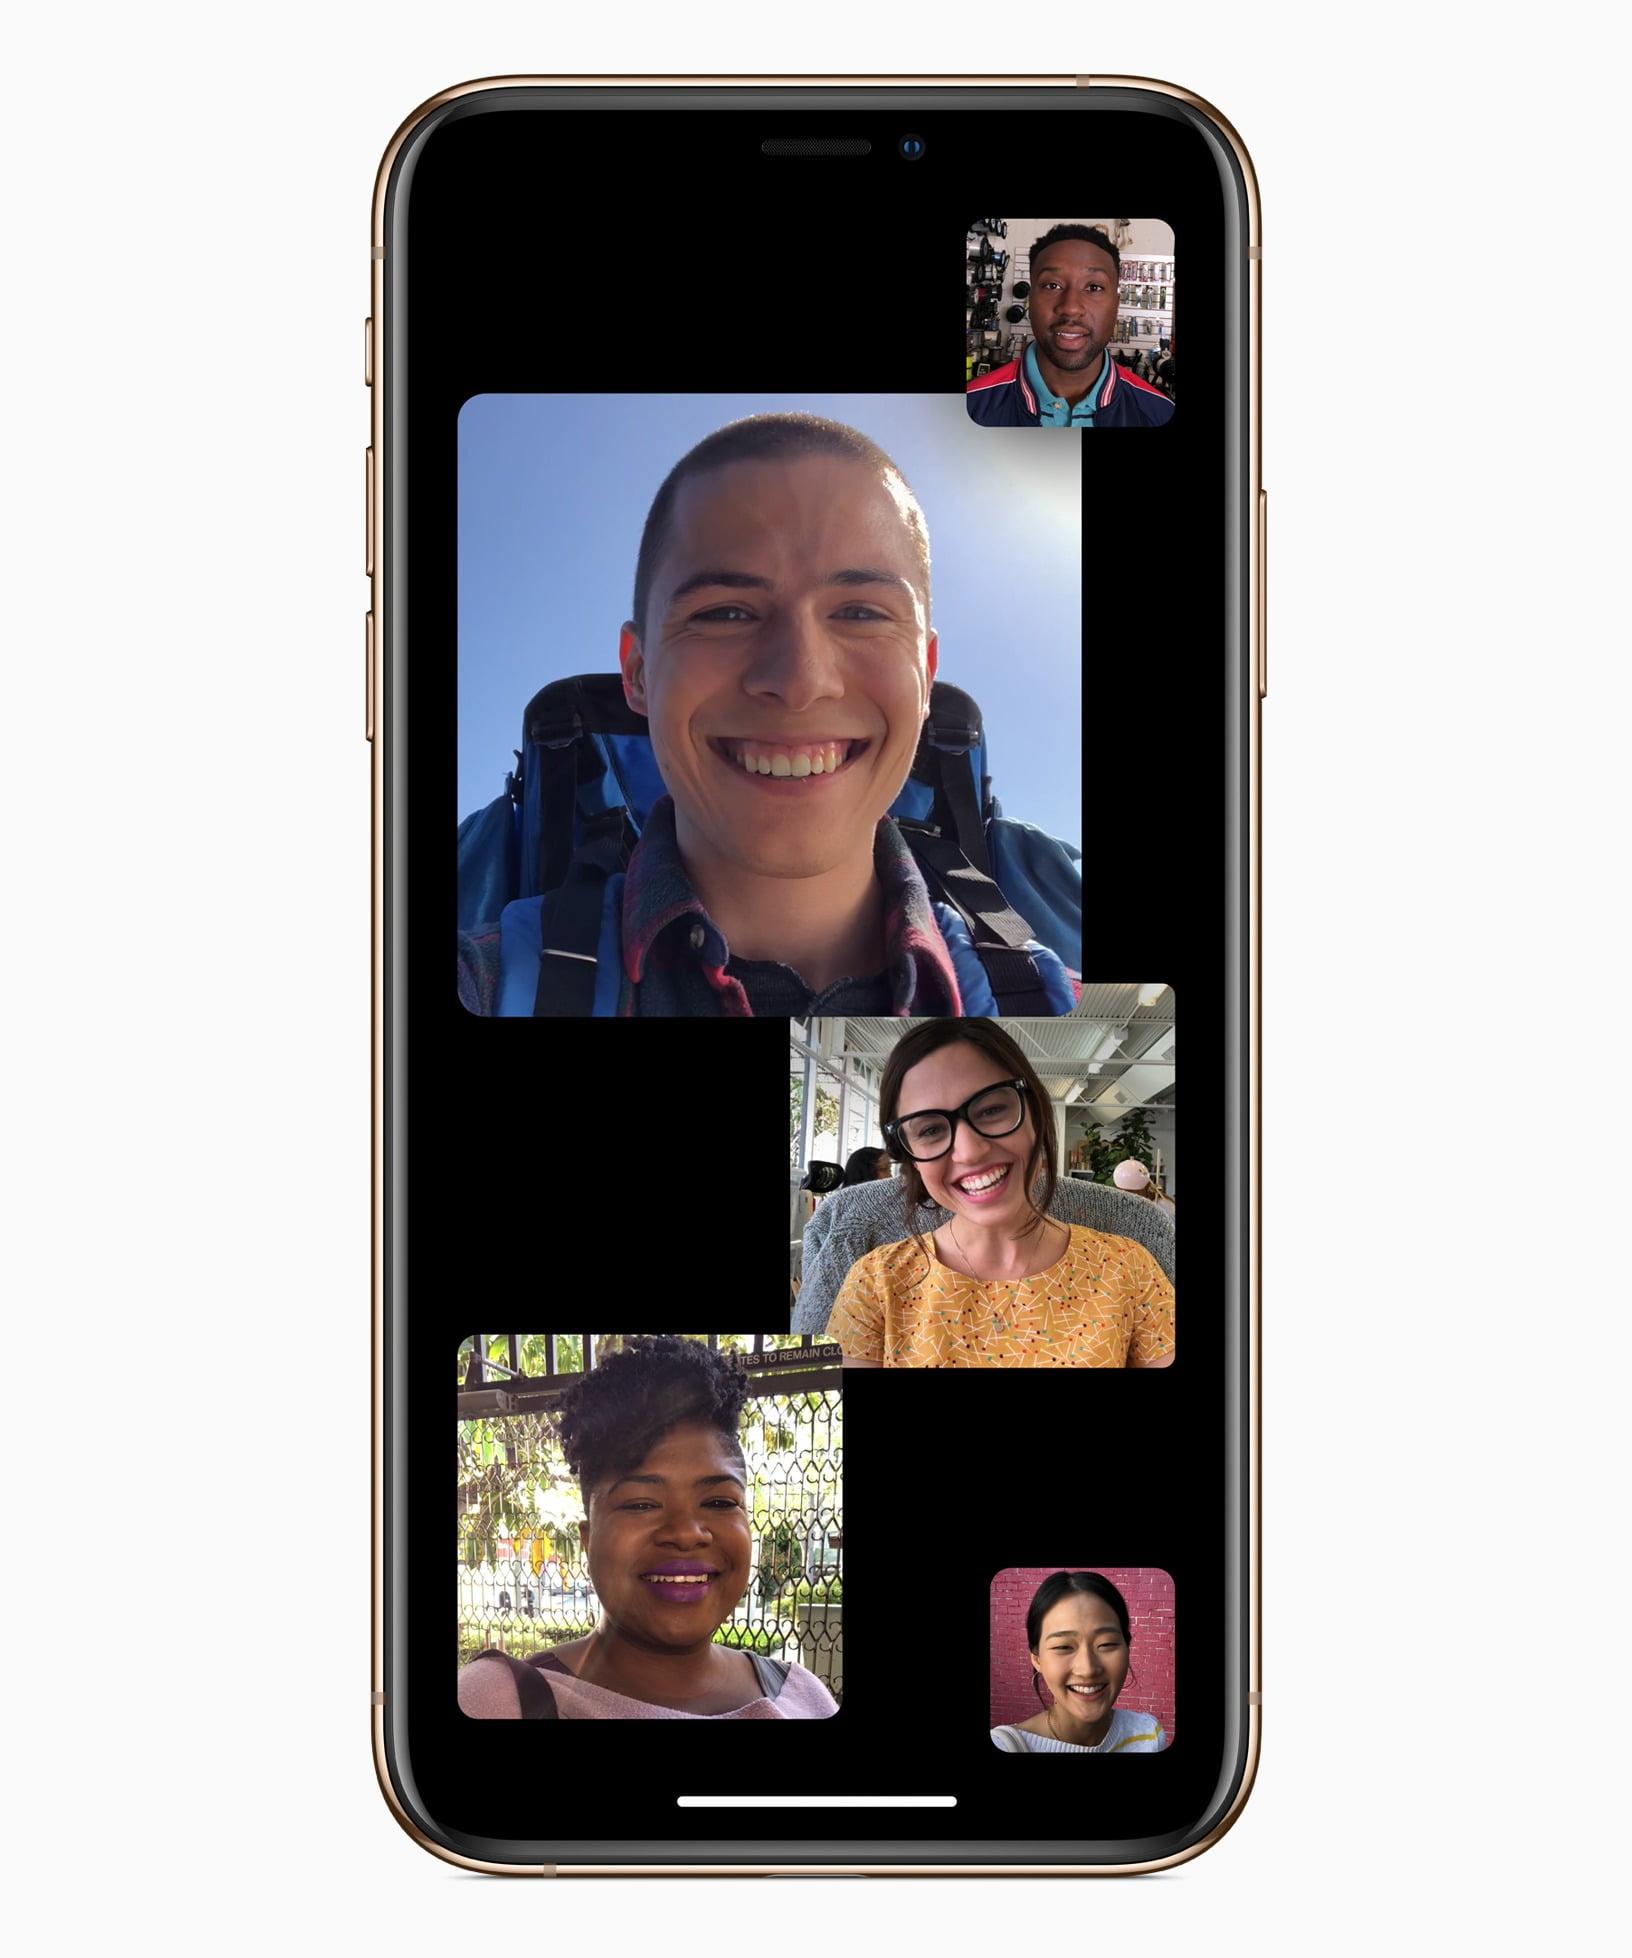 ios 122 emoji facetime group facetime 10292018